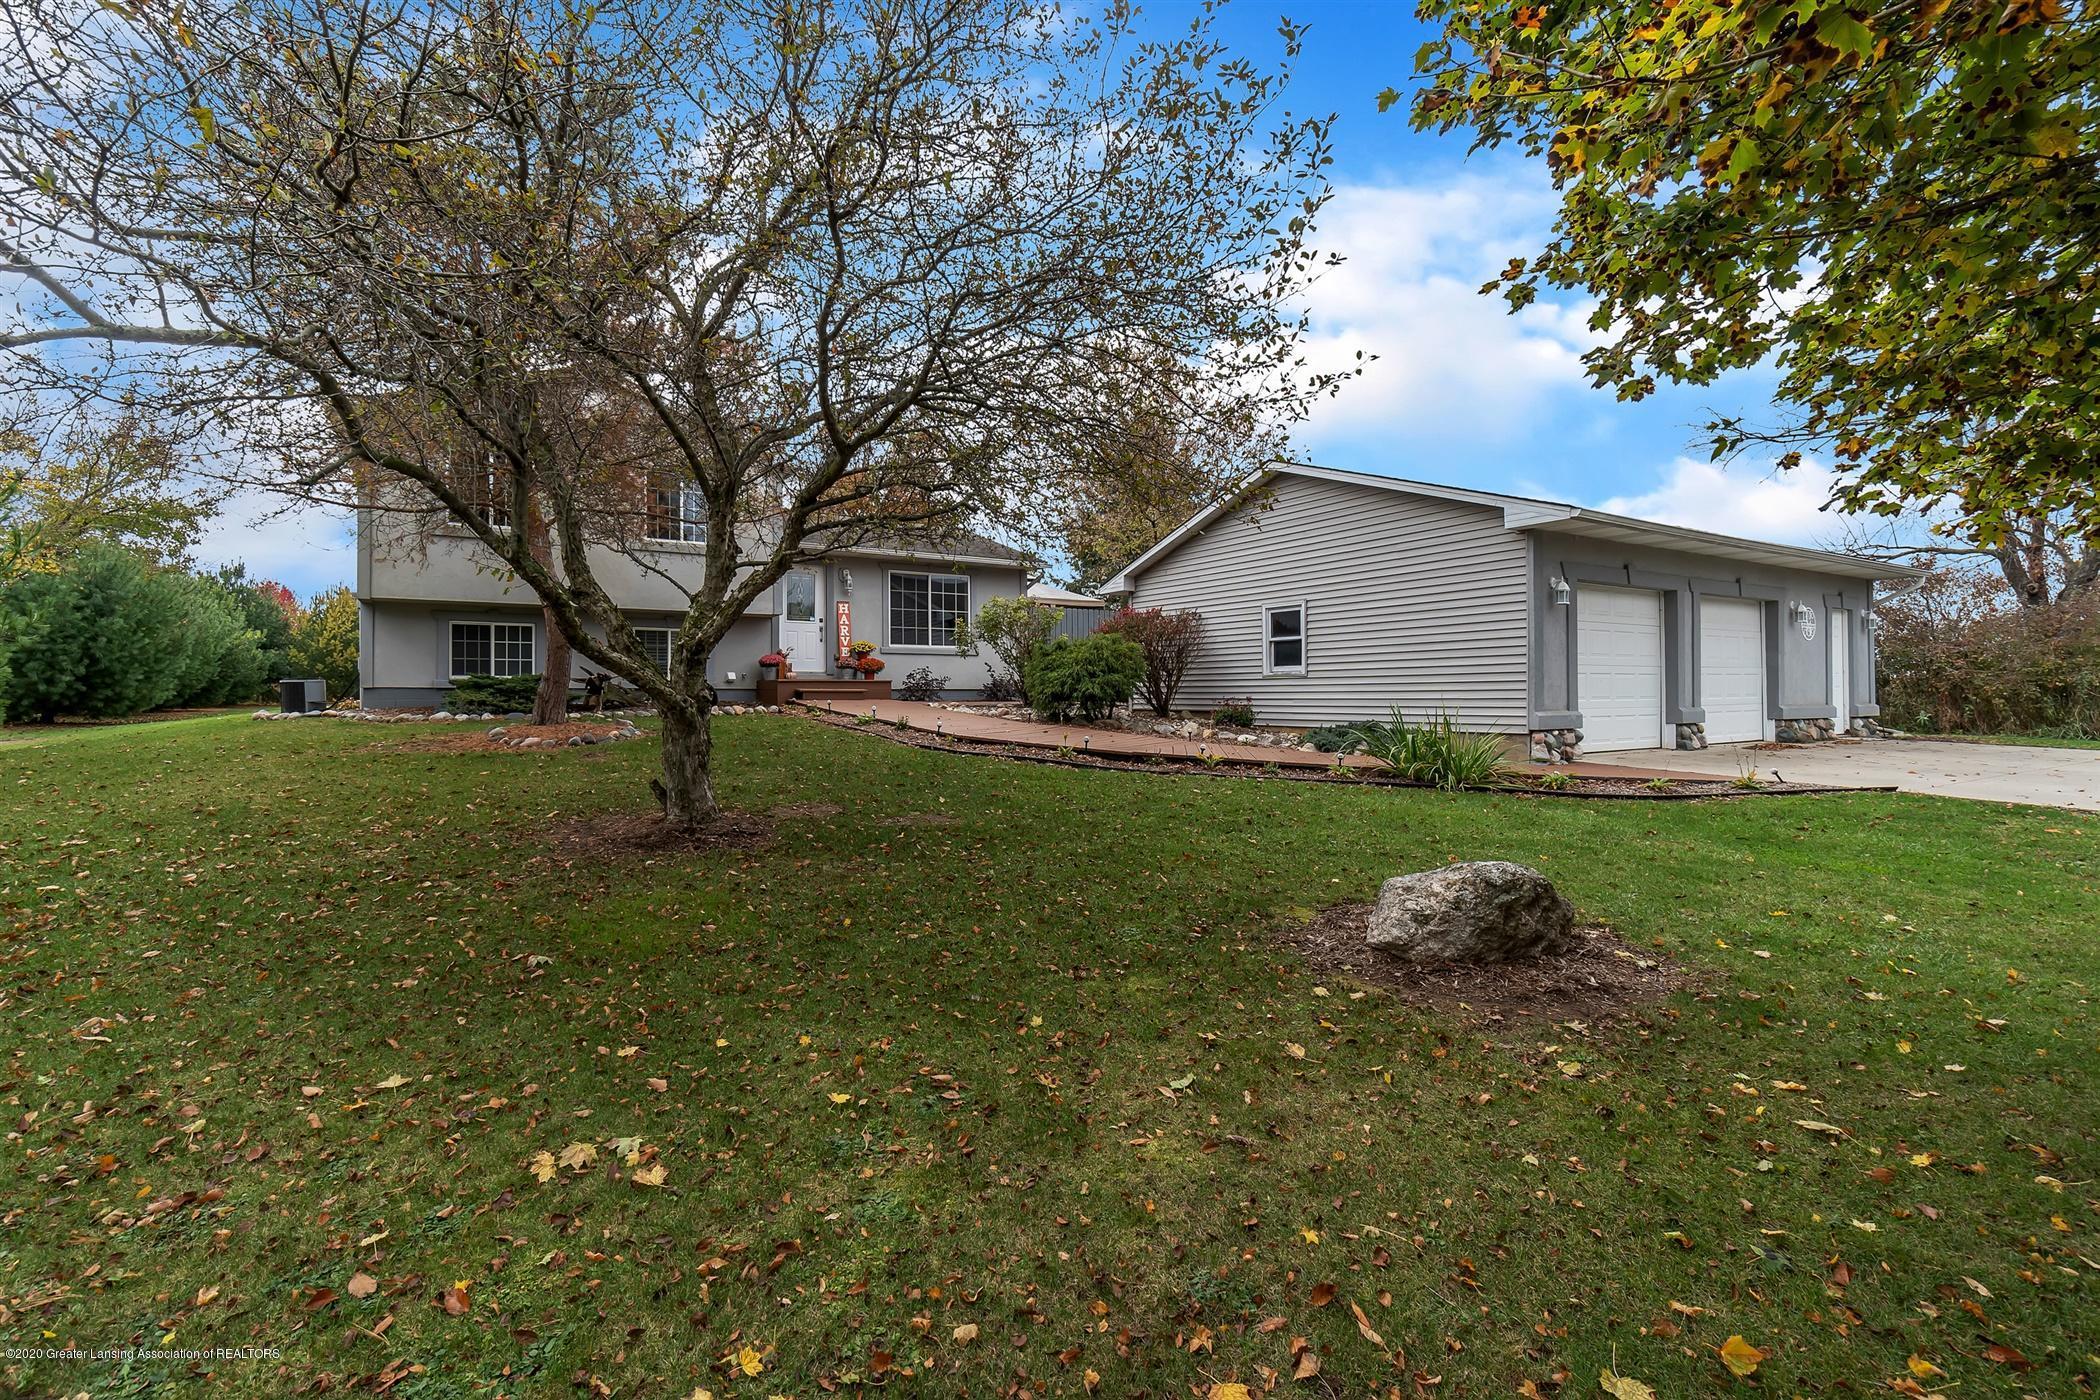 11572 Kinneville Rd - 02-11572 Kinneville Rd -WindowStill - 2